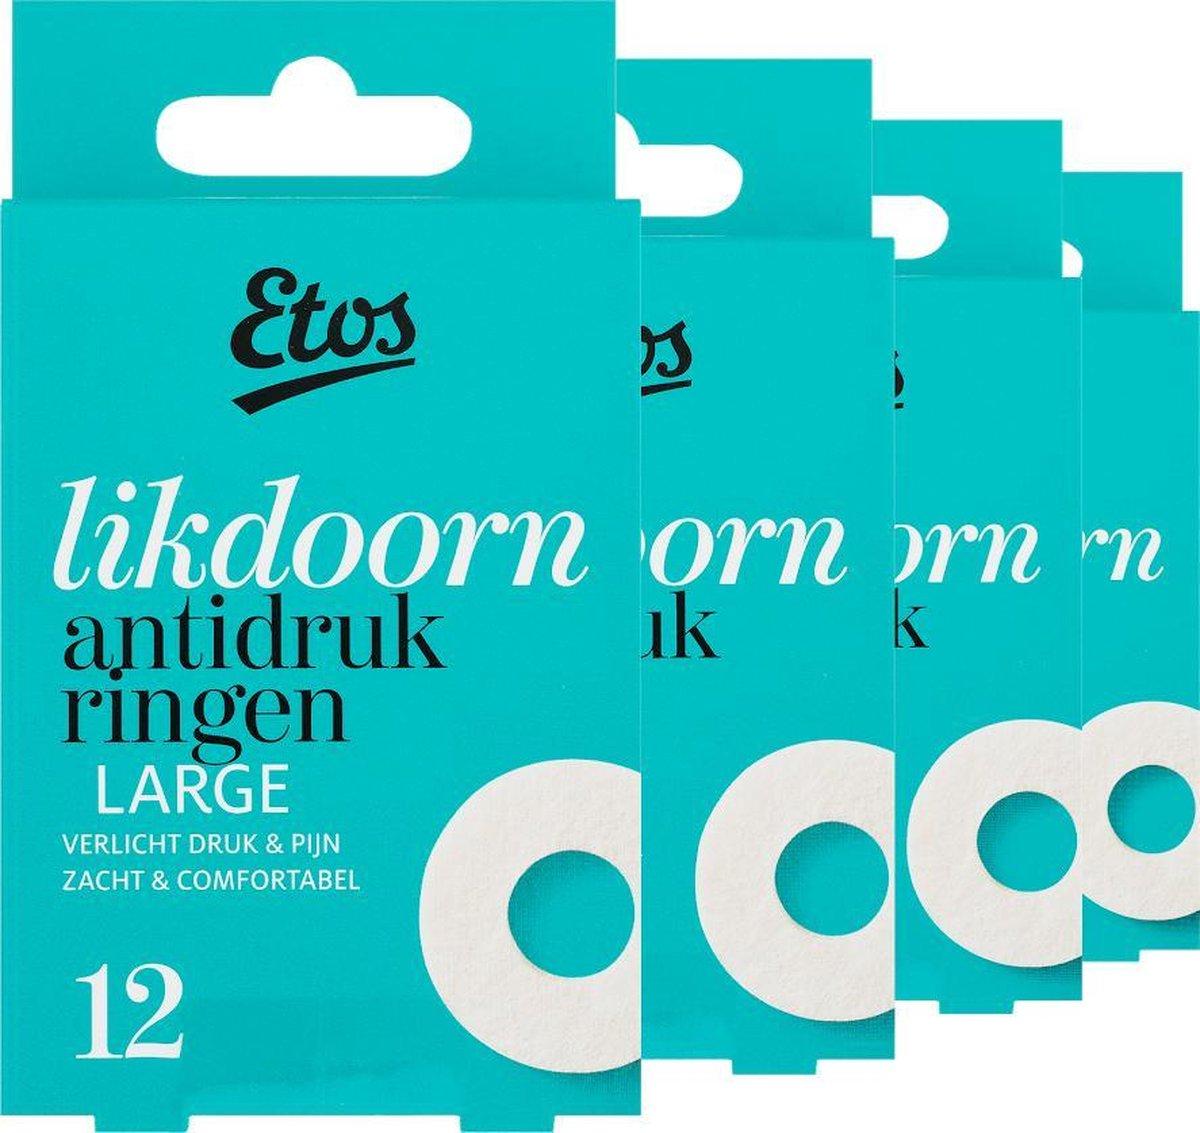 Etos Likdoorn Anti-Drukringen Large -  48 stuks (4 x 12 stuks)